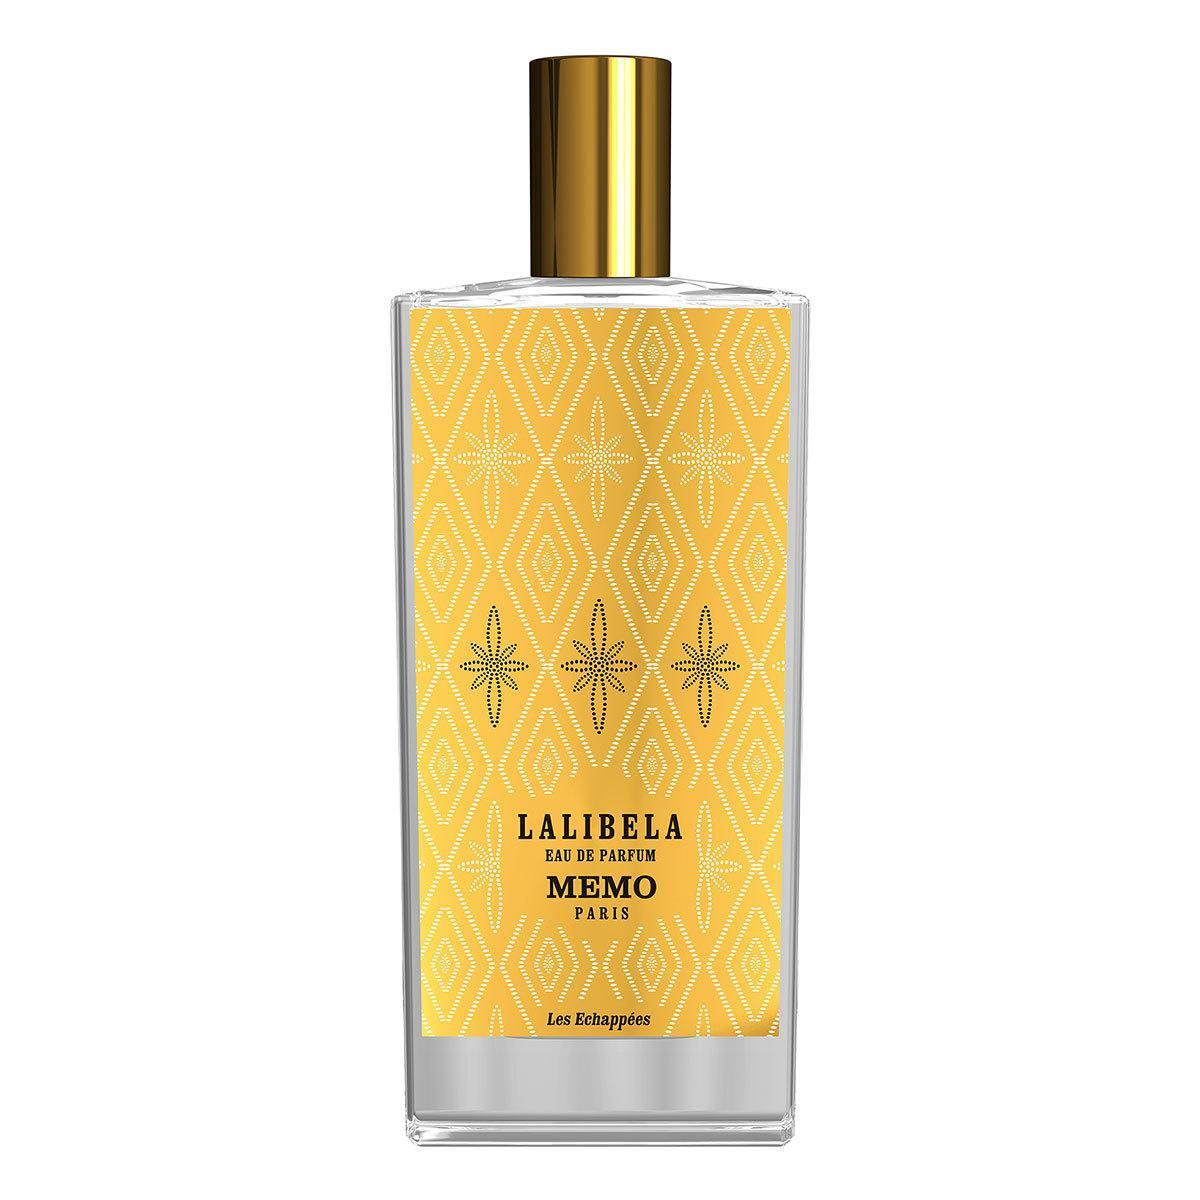 Memo Lalibela парфюмированная вода 75 ml. (Тестер Мемо Лалибела)